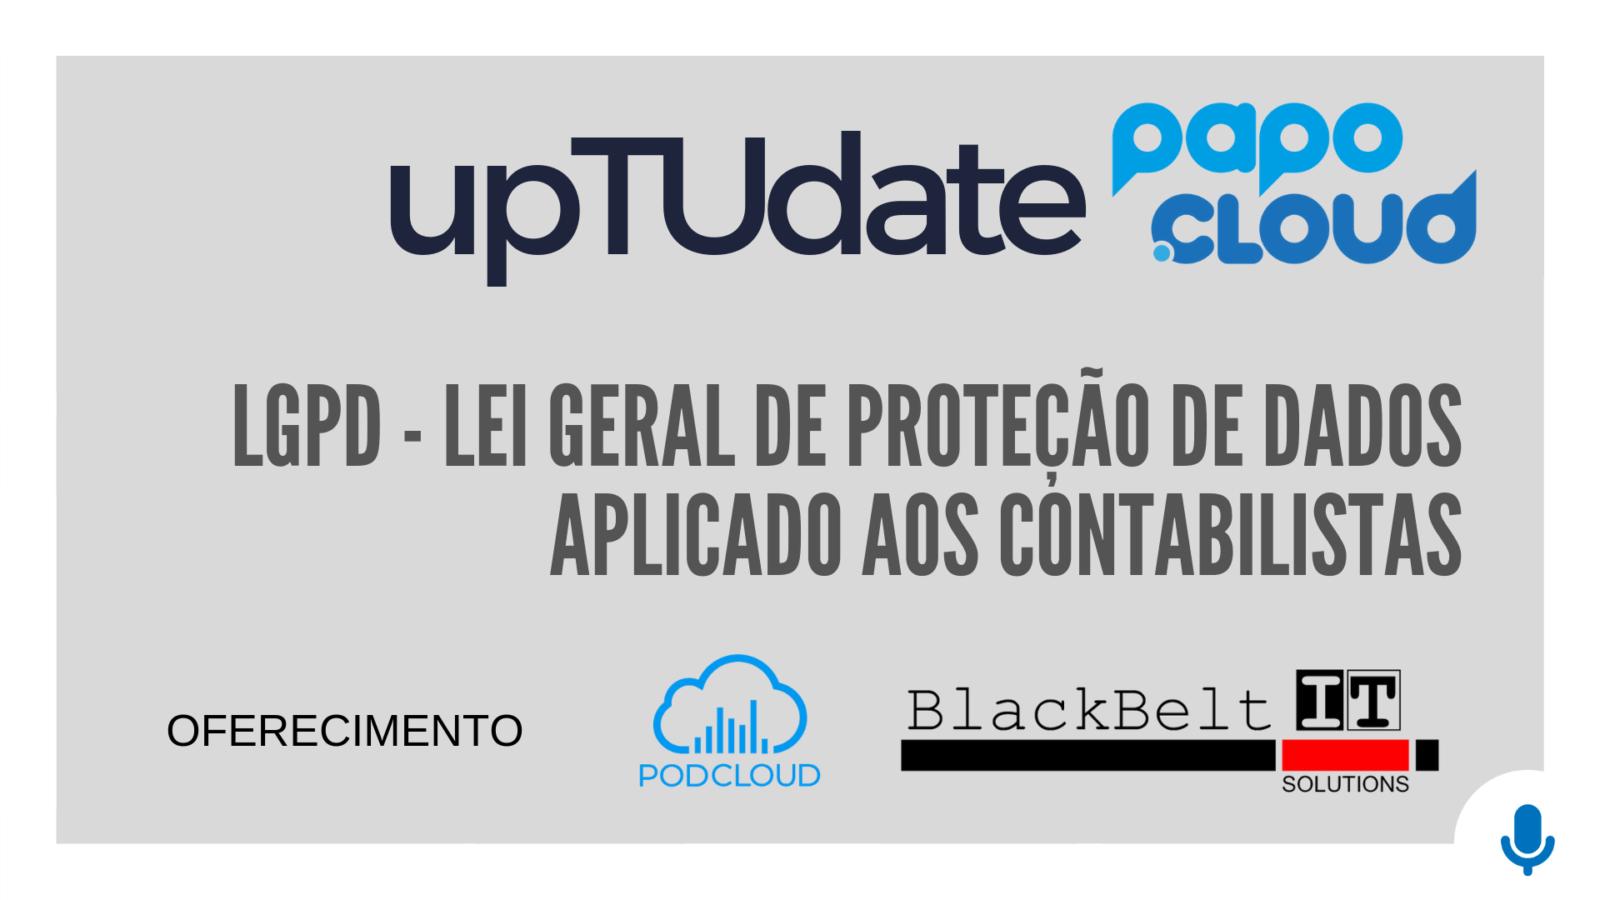 upTUdate - BlackBelt - LGPD Aplicado aos CONTABILISTA